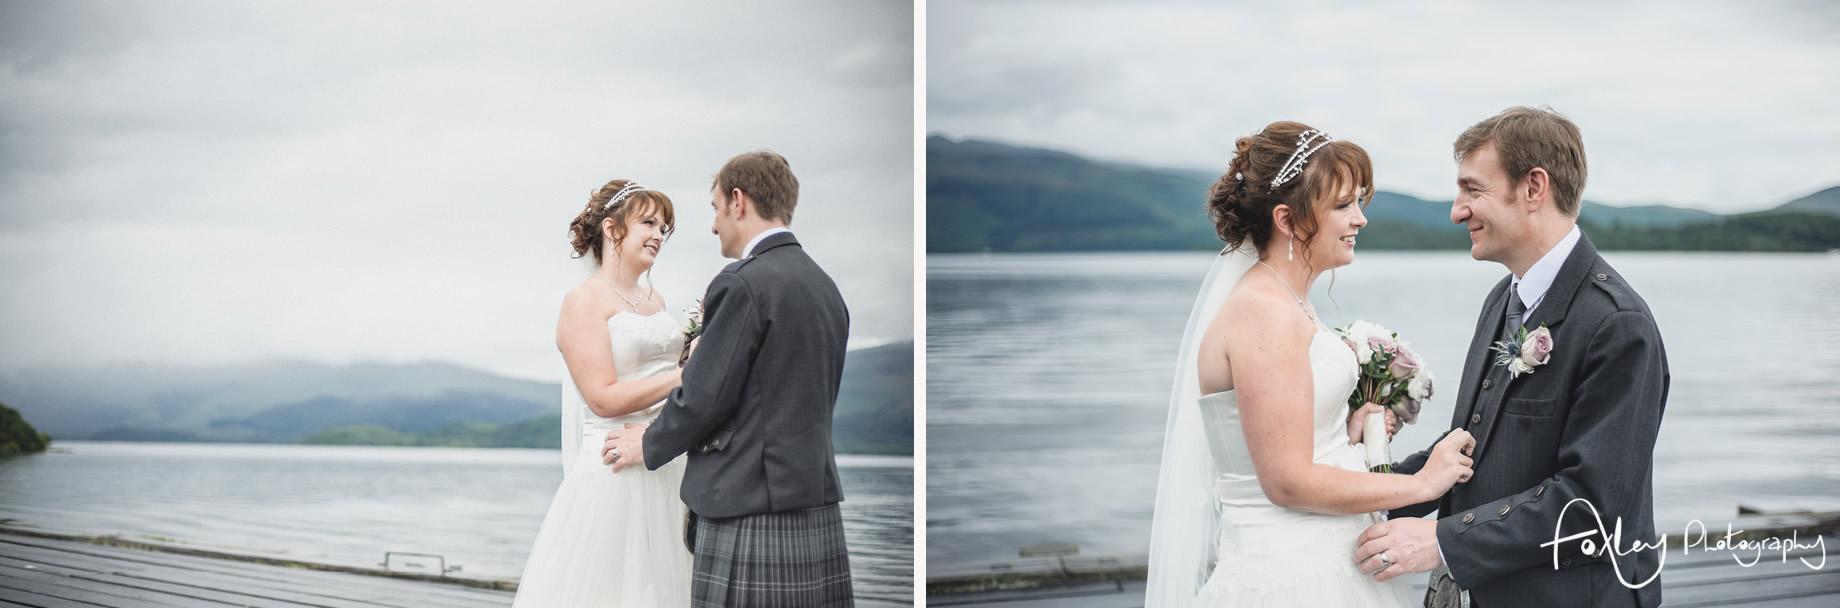 Alys-And-Davids-Wedding-Loch-Lomond-111